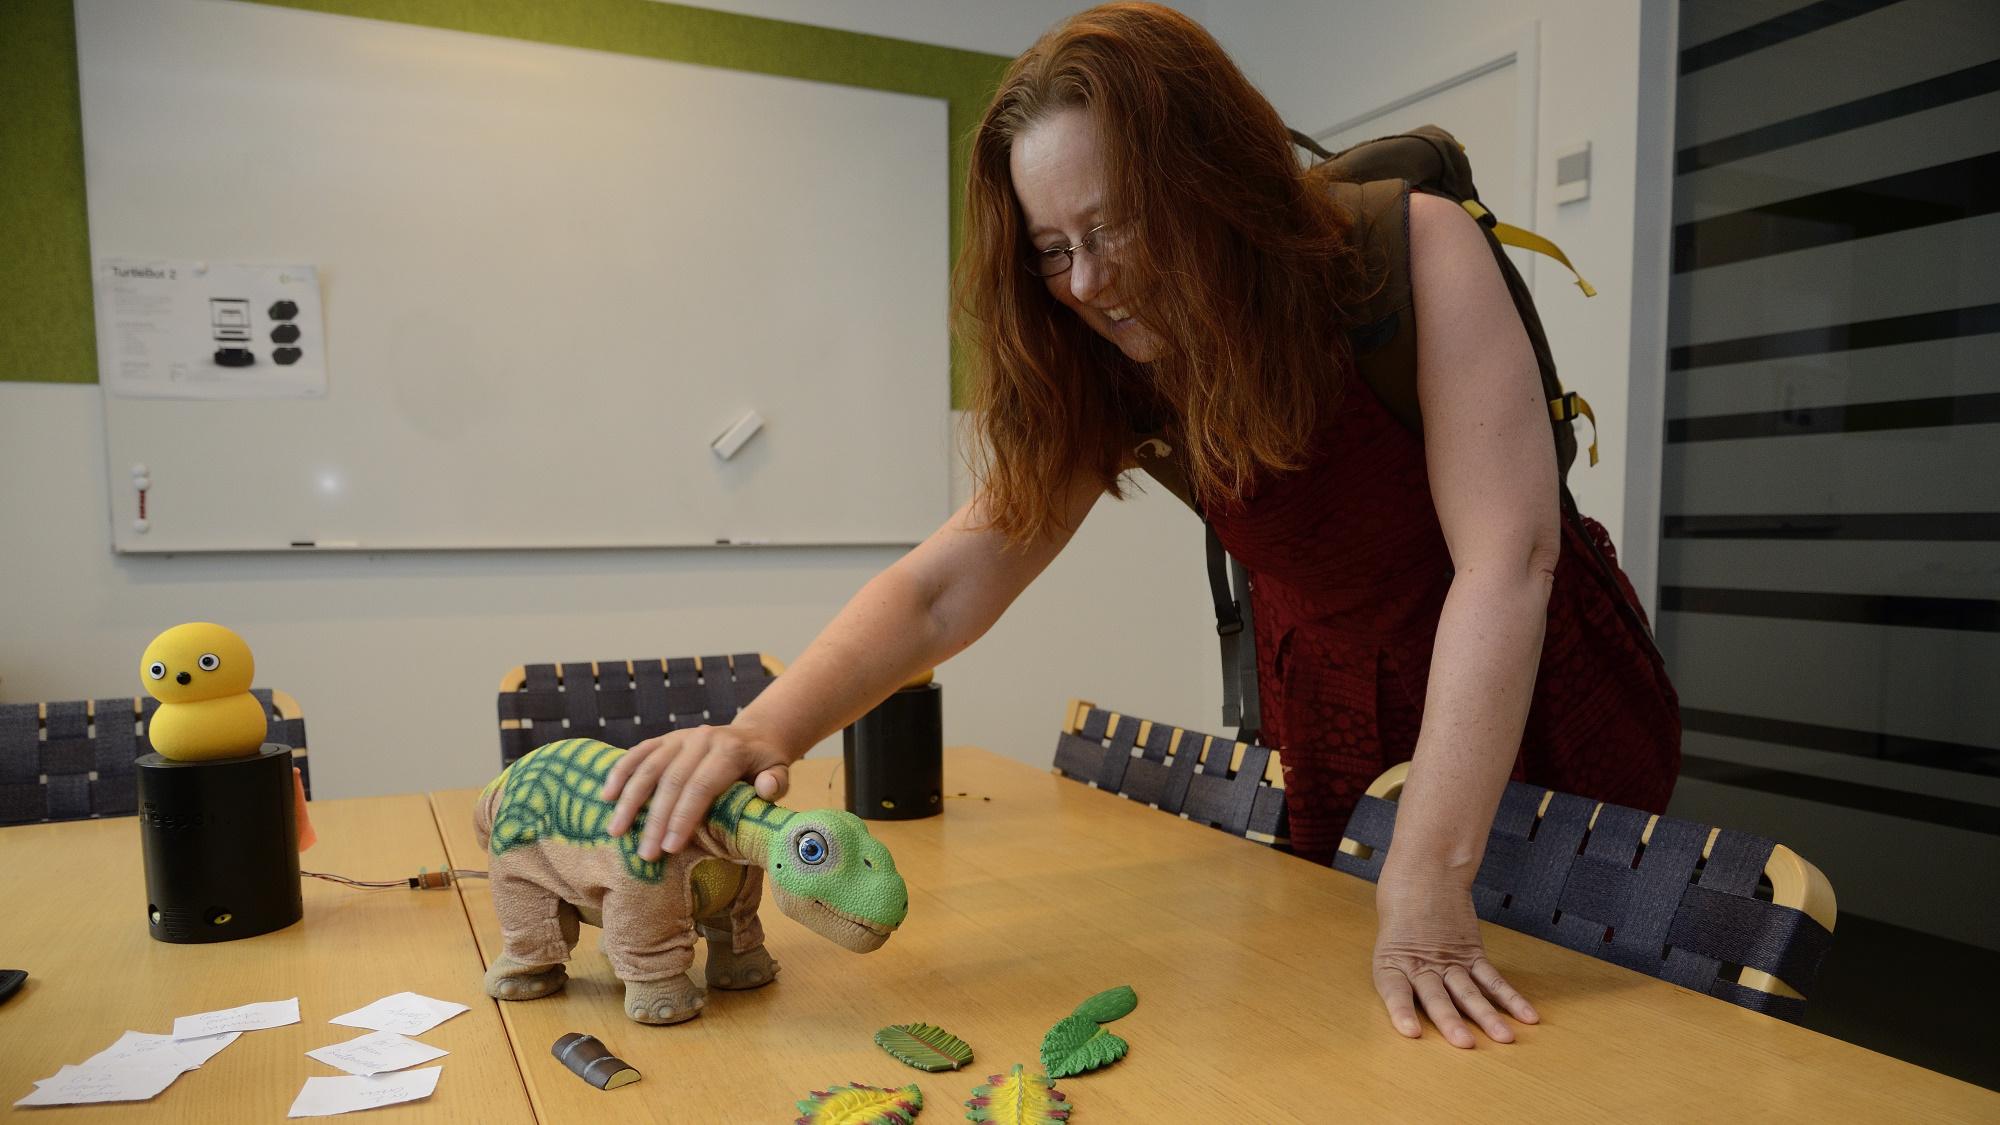 A Pleo robot who enjoys human affection.